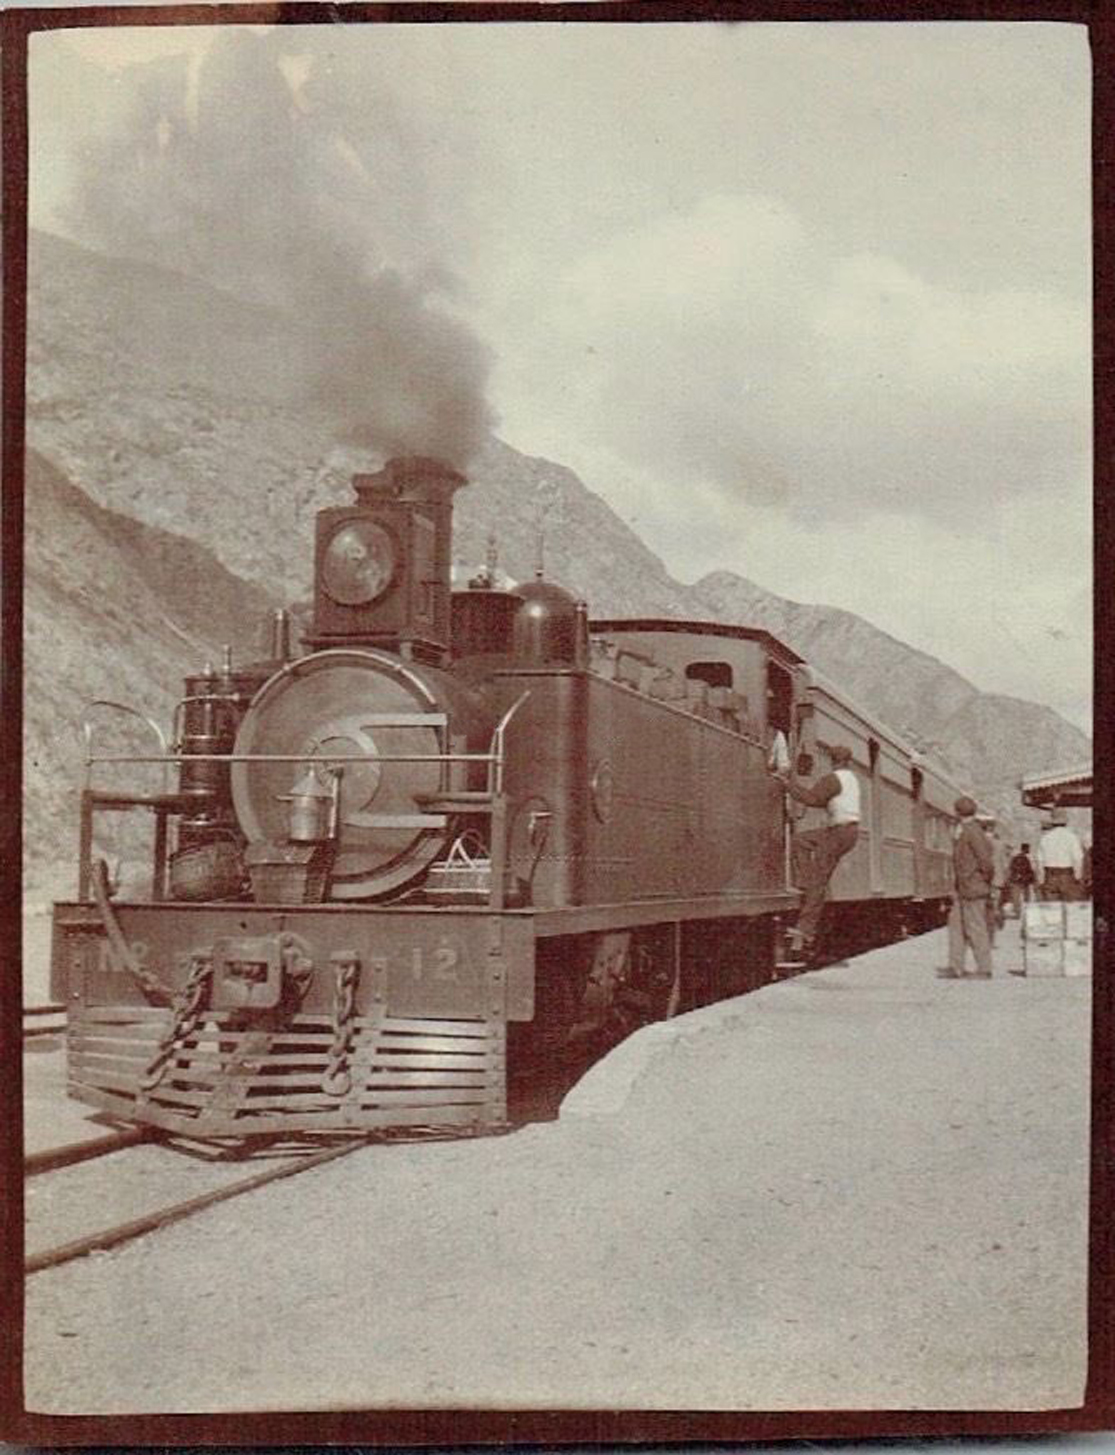 Enterreno - Fotos históricas de chile - fotos antiguas de Chile - Tren Transandino en 1902